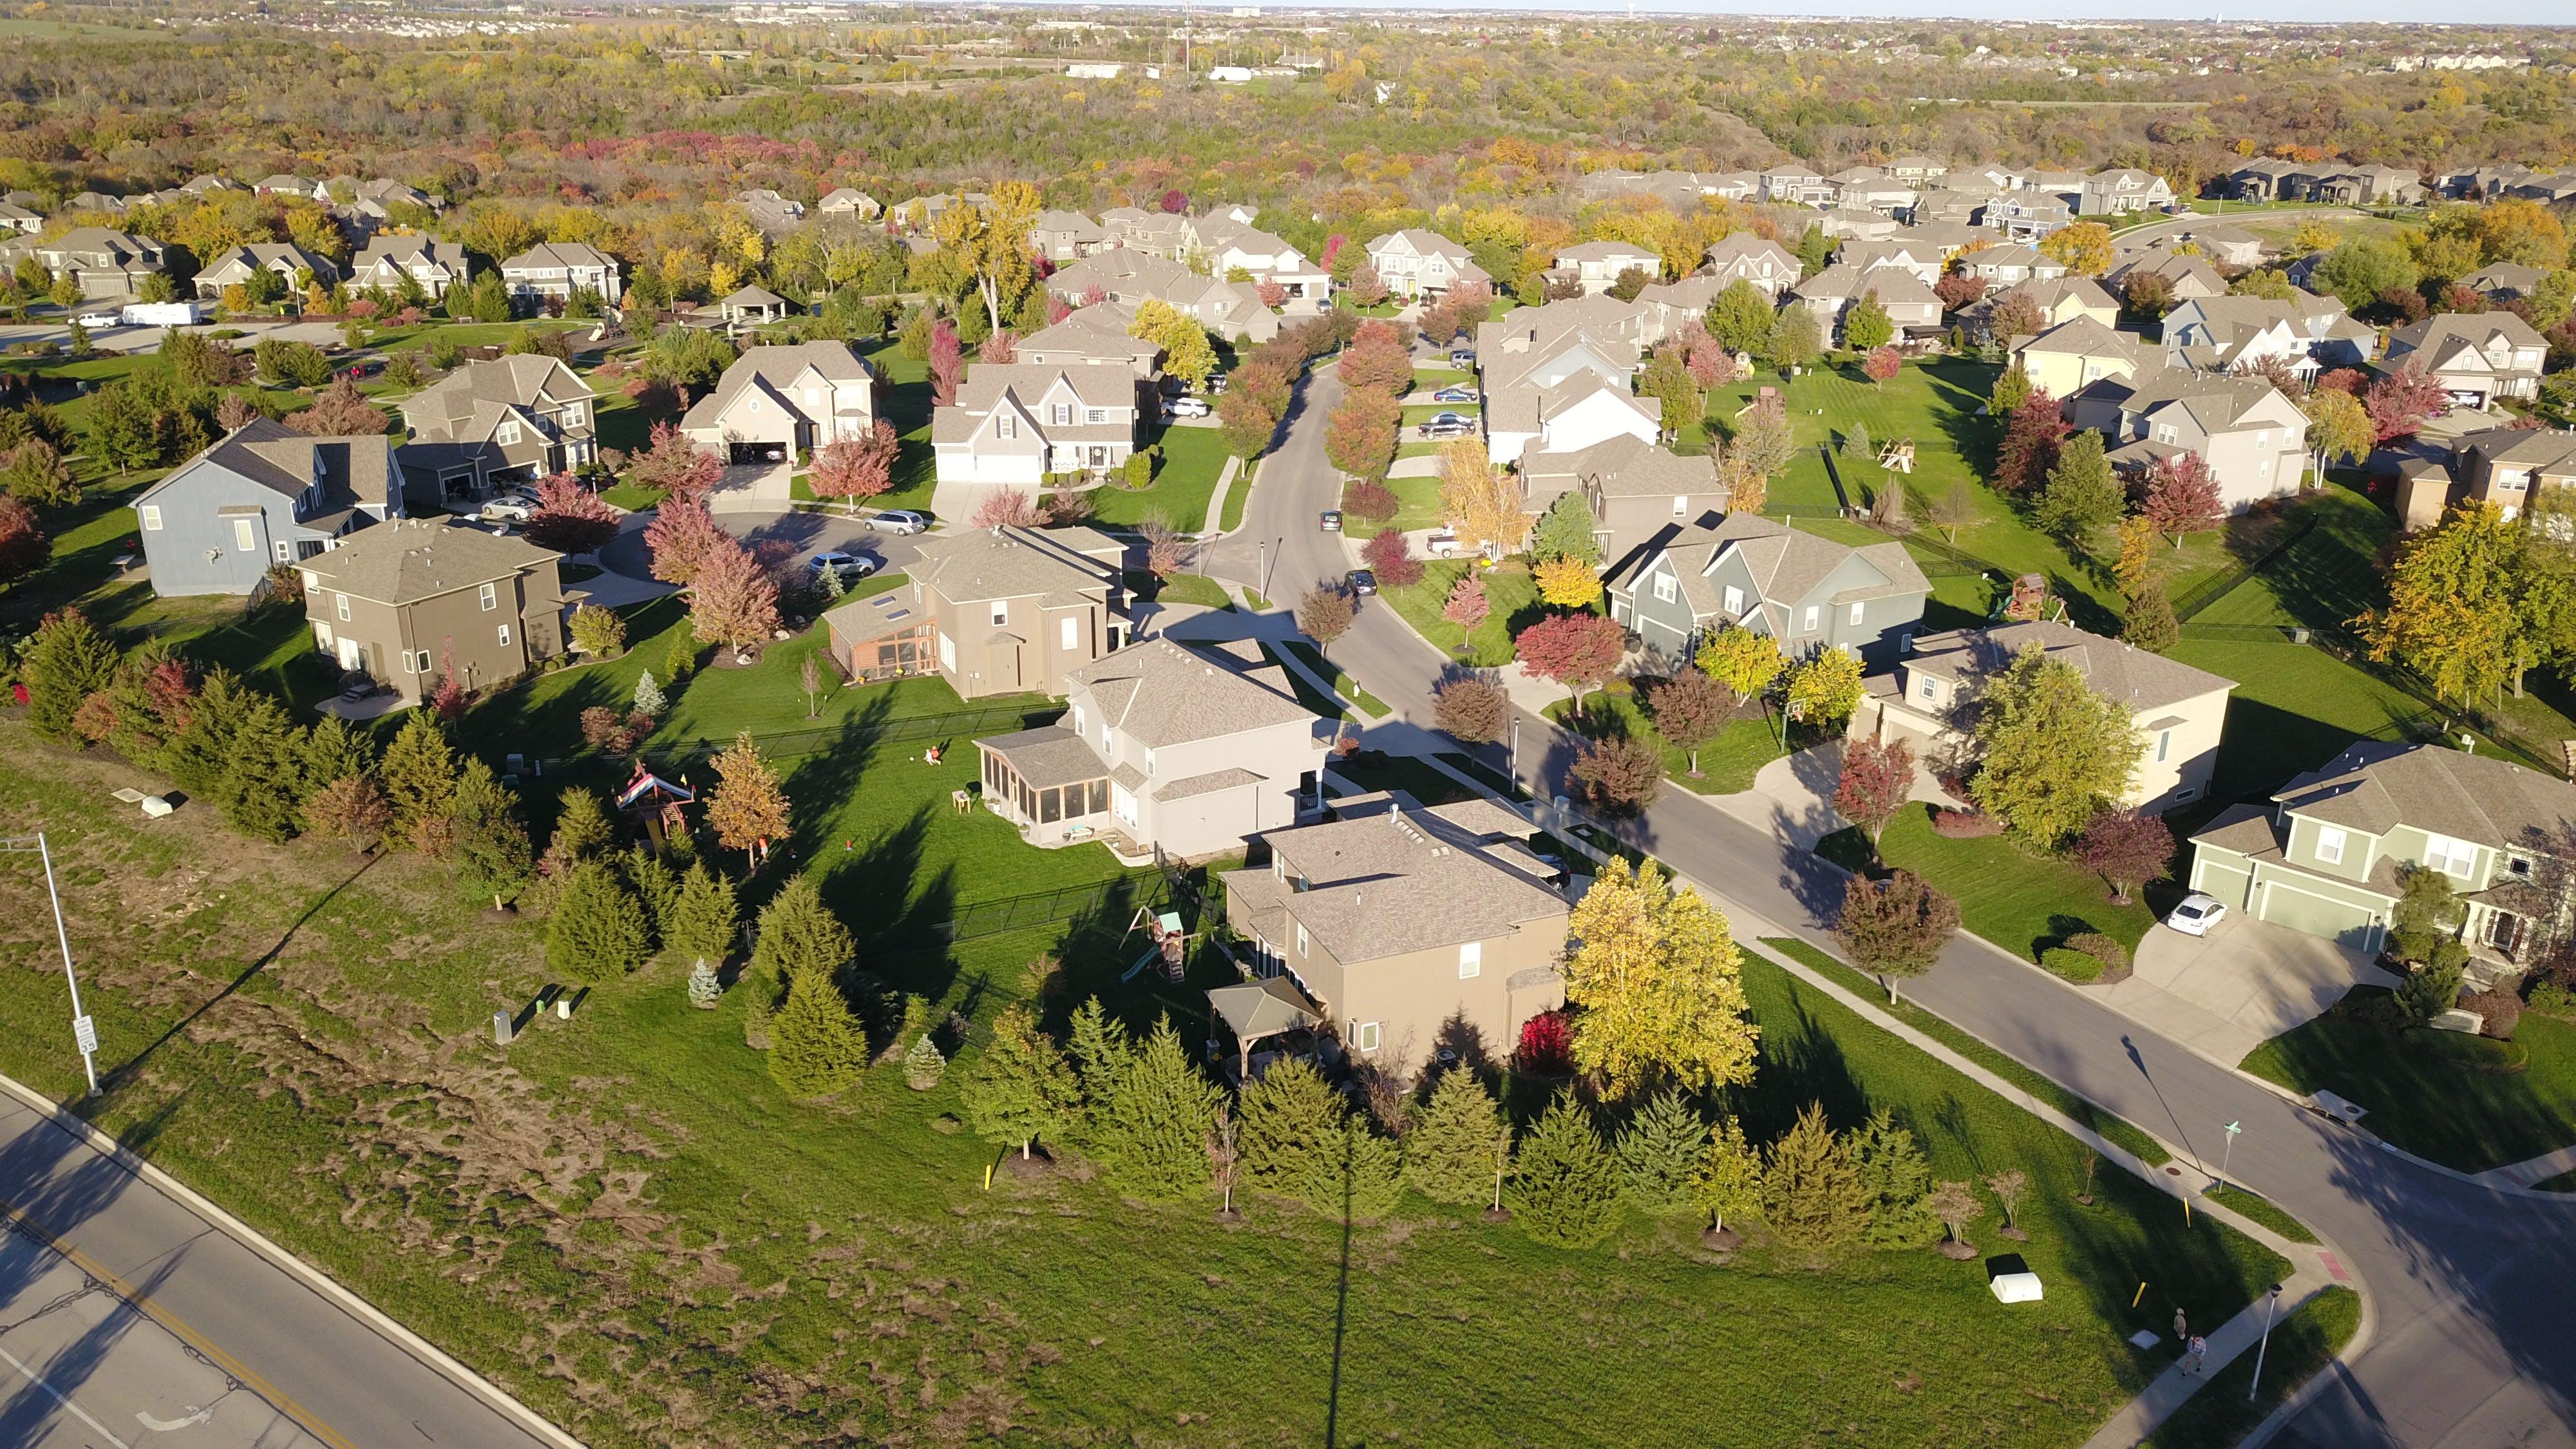 Free stock photo of houses, neighborhood, autumn colors, suburb